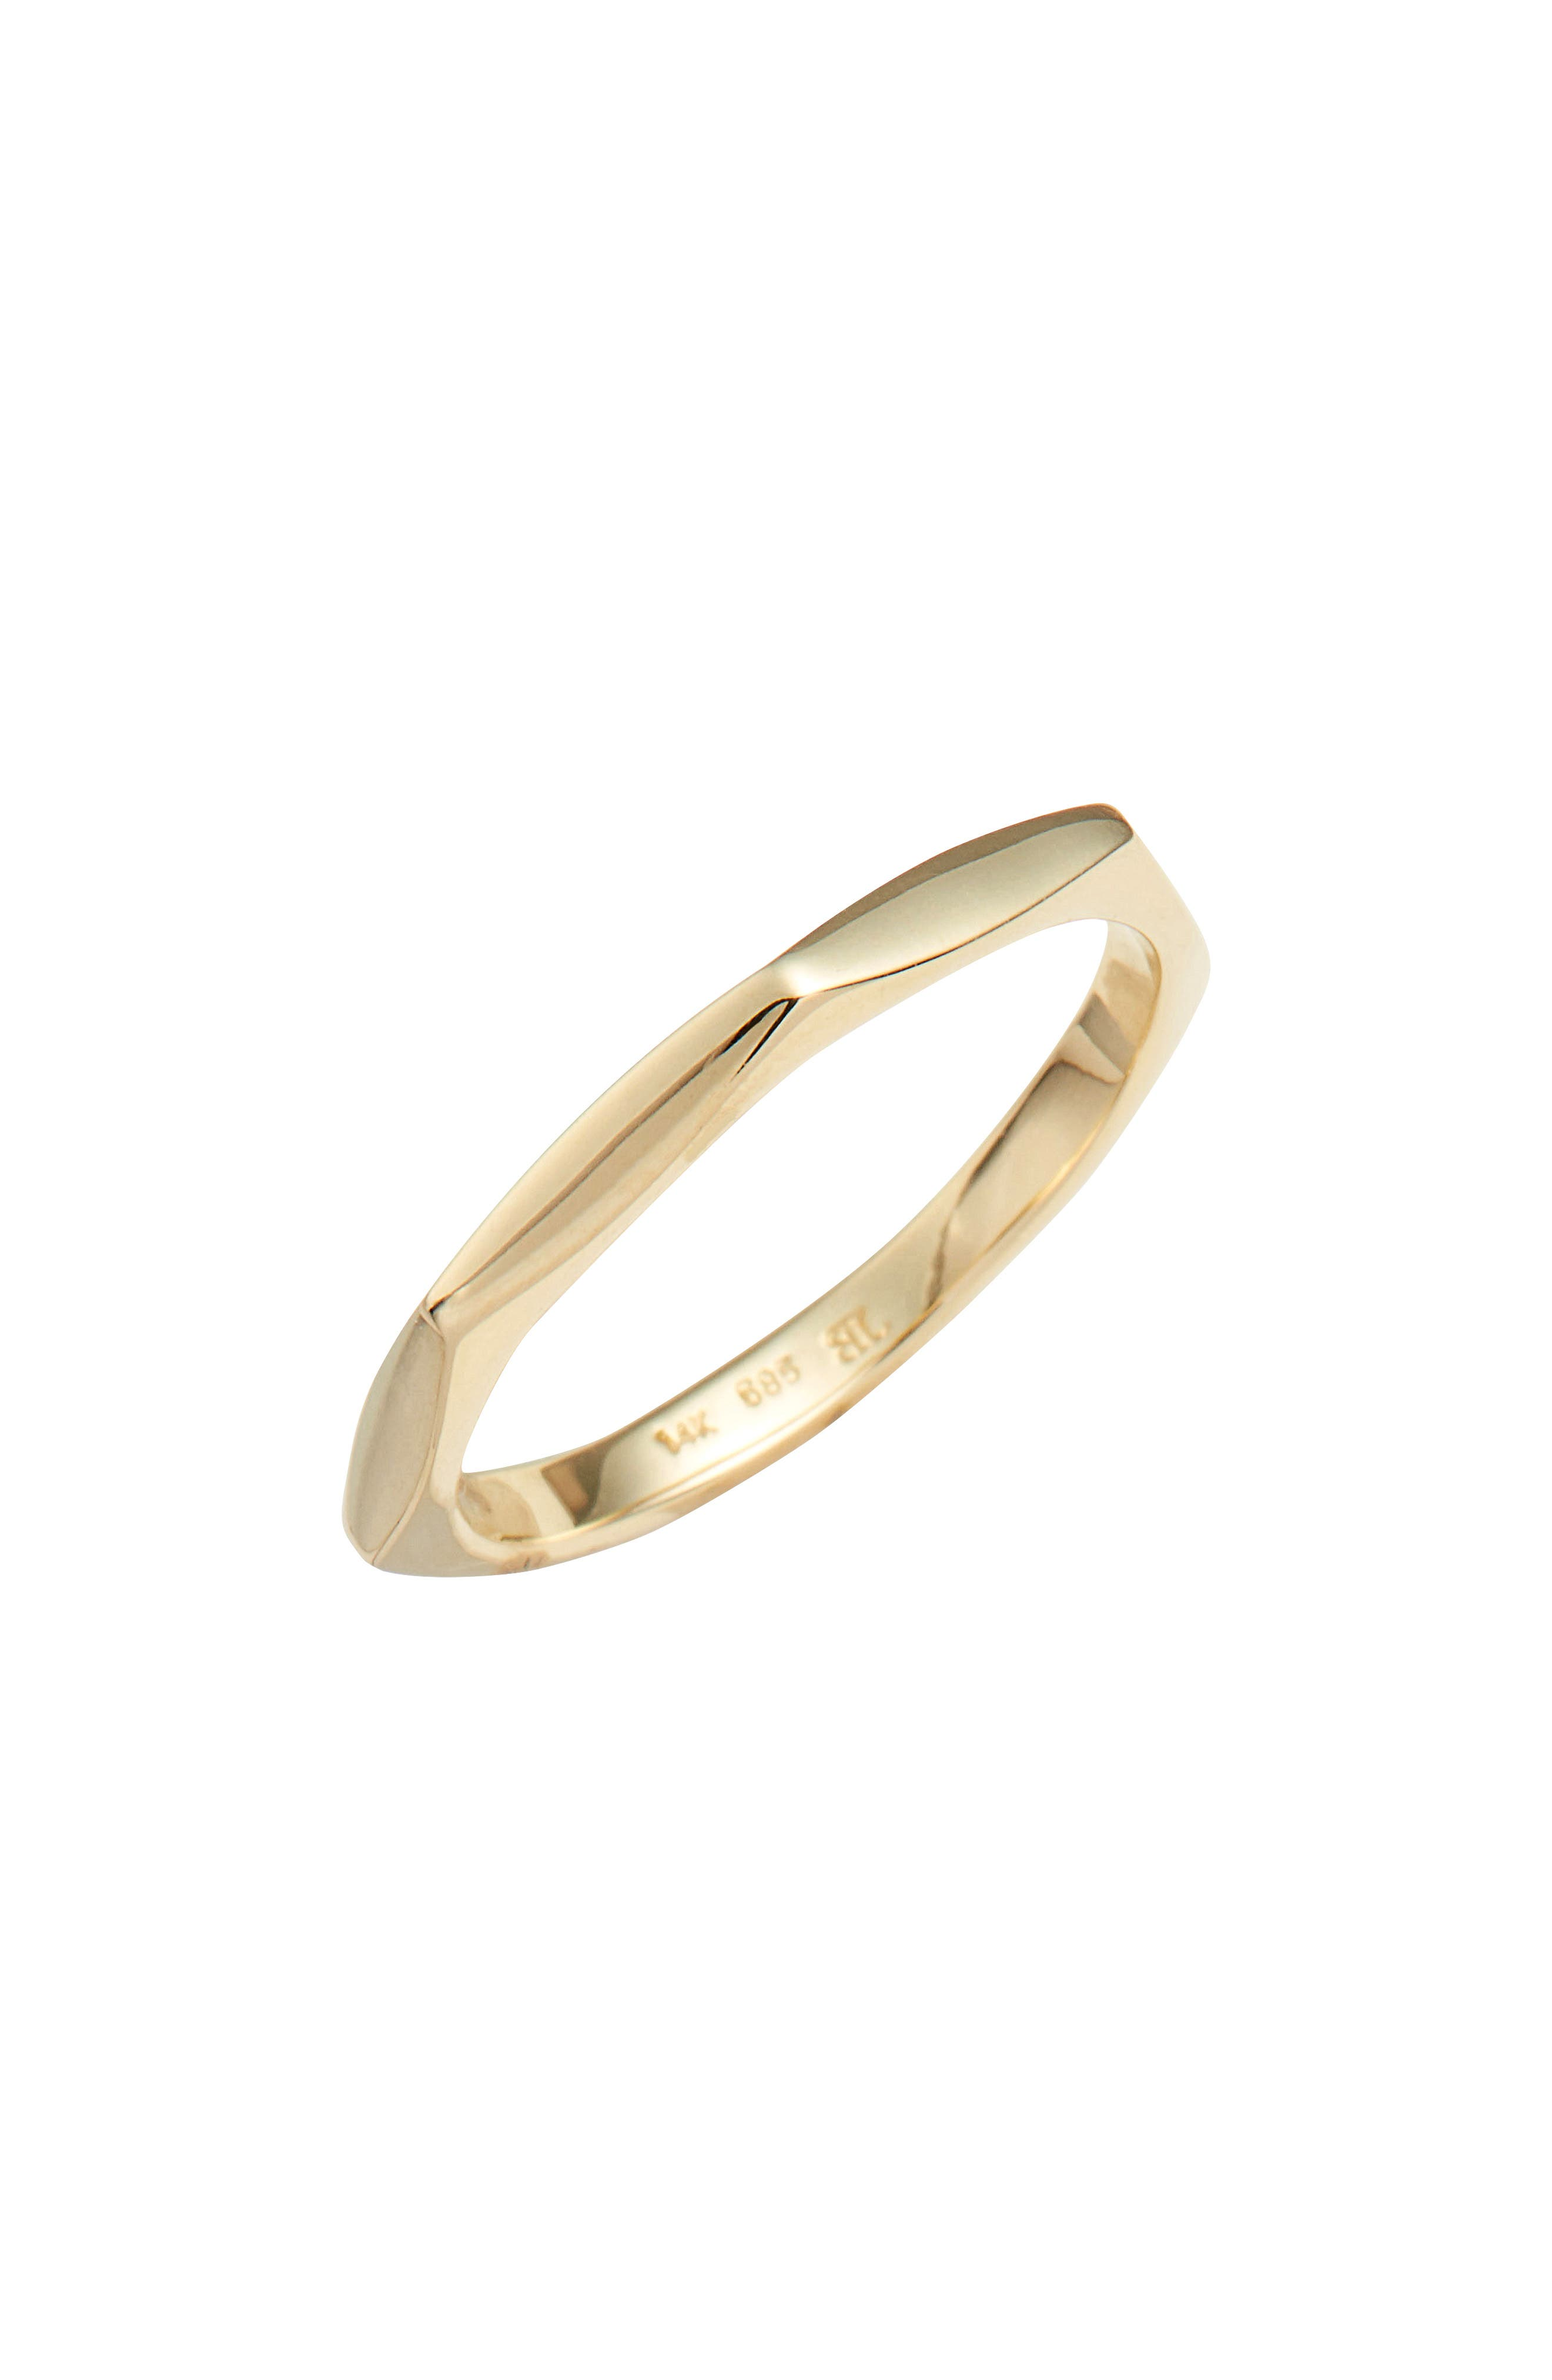 Geometric Band,                             Main thumbnail 1, color,                             YELLOW GOLD